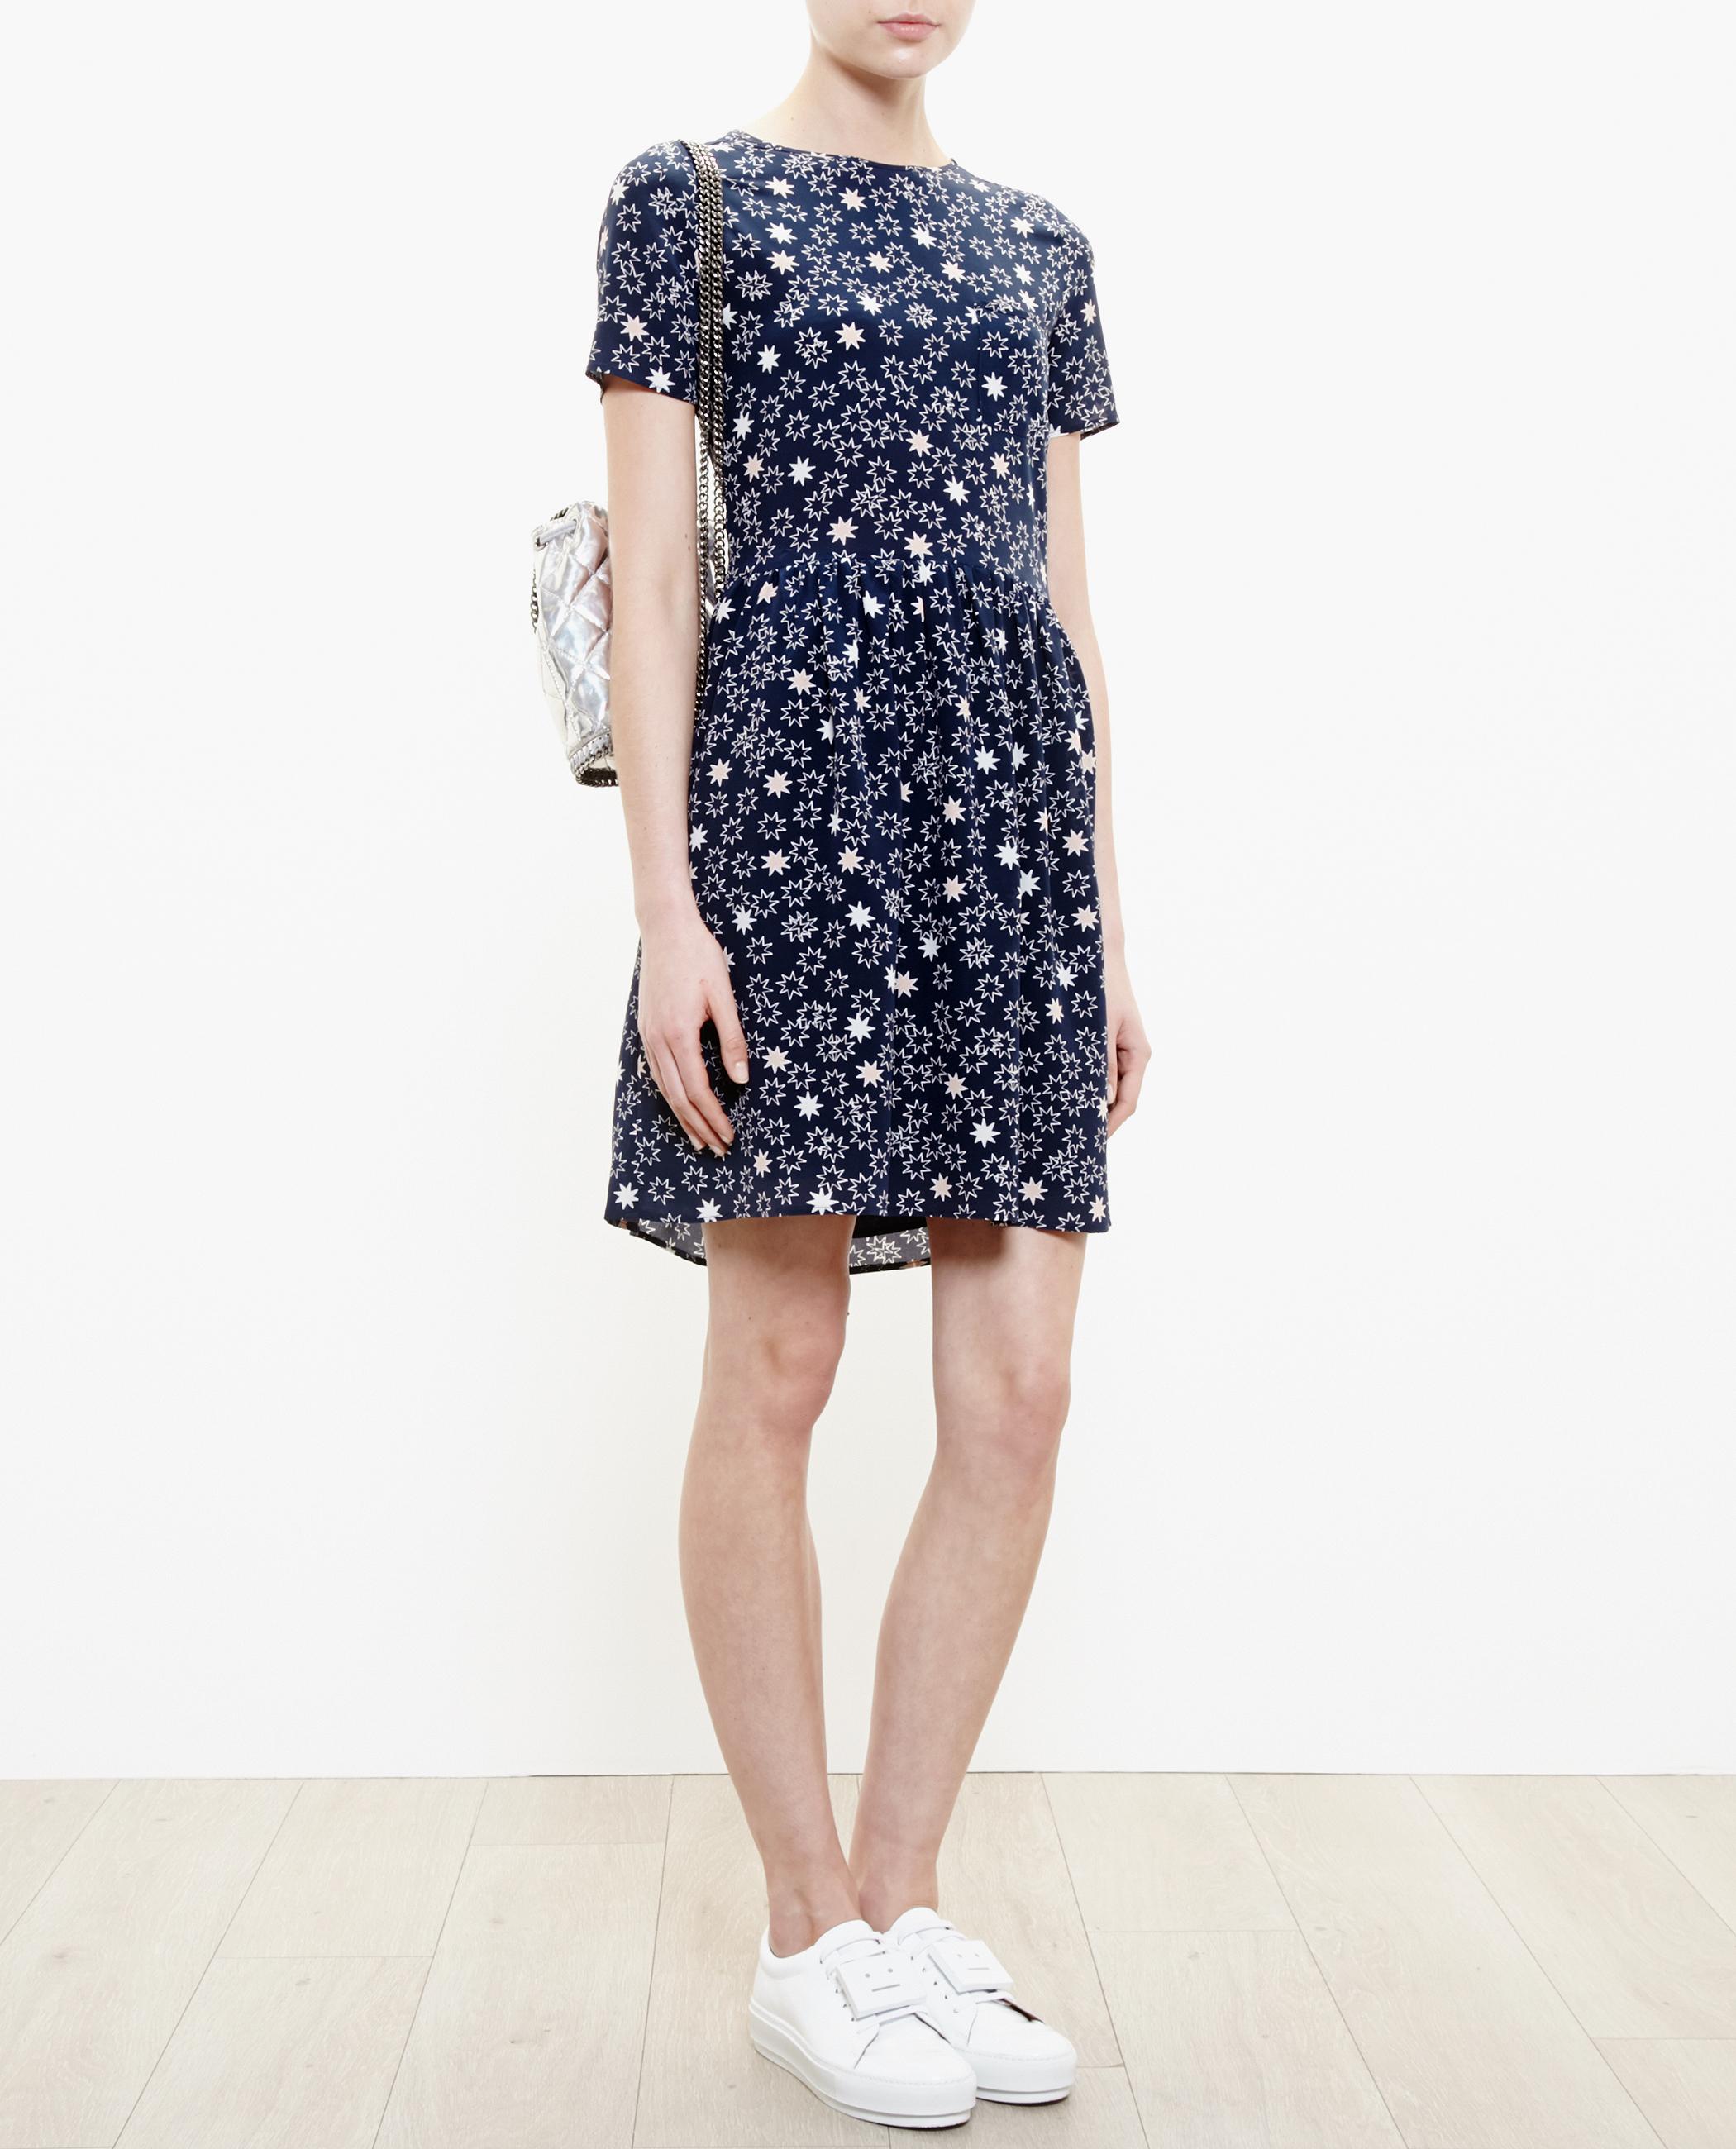 DRESSES - Short dresses Chinti and Parker 9zAxh6tTNo